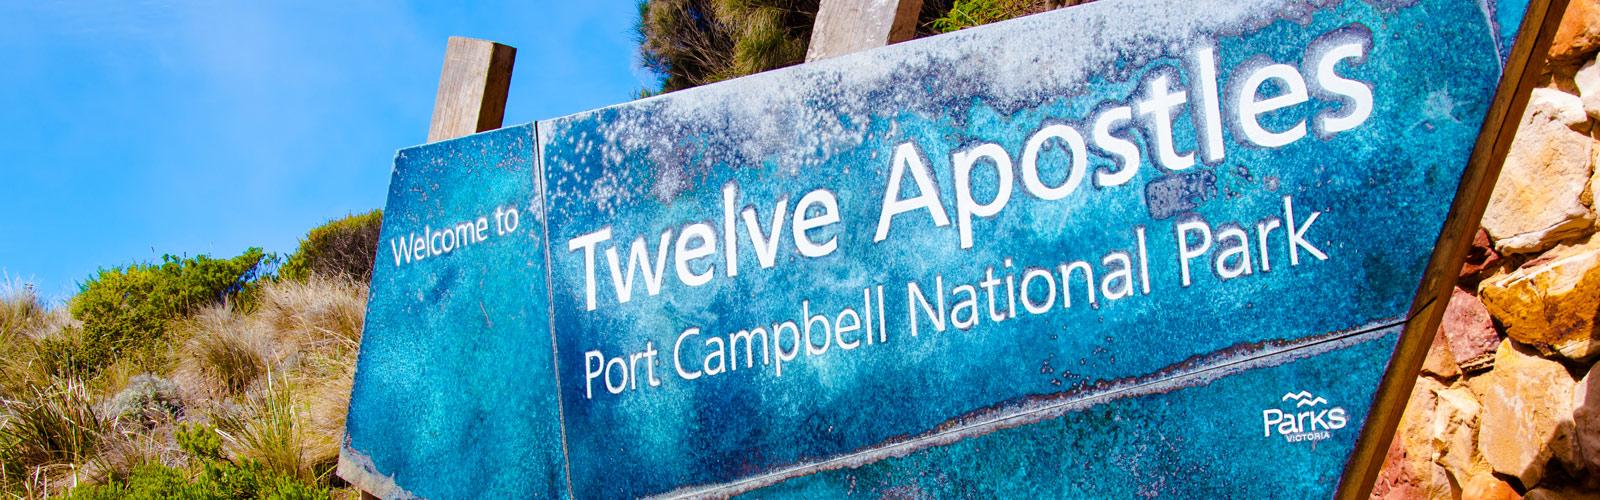 Port Campbell, Great Ocean Road